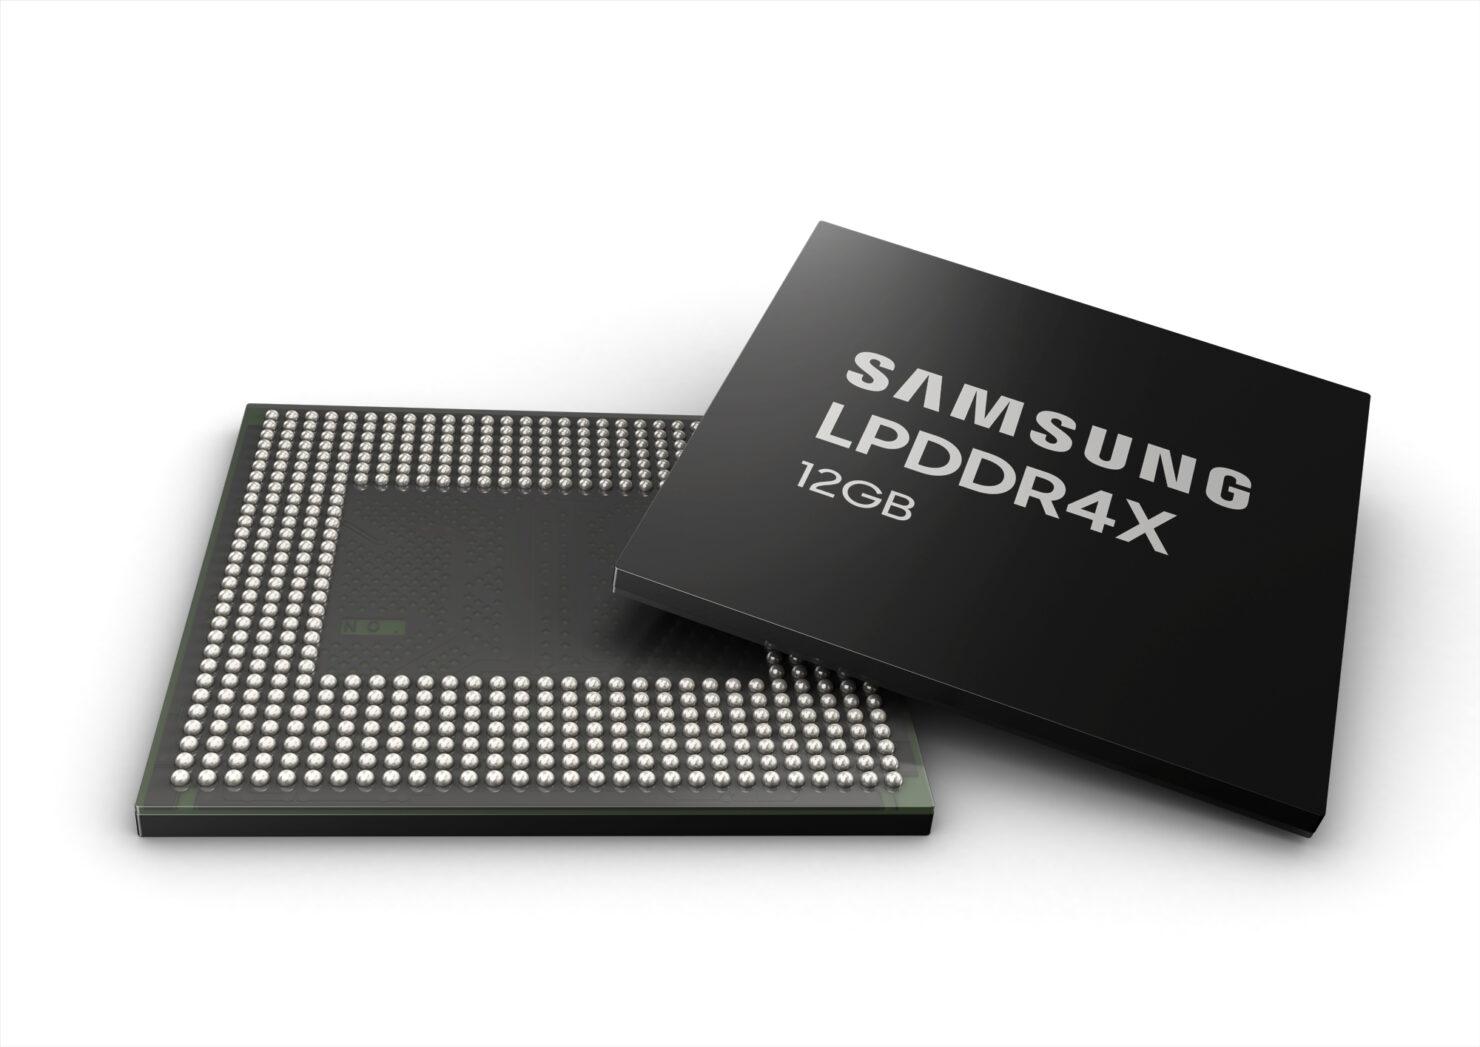 Samsung 12GB LPDDR4 DRAM for smartphones (1)